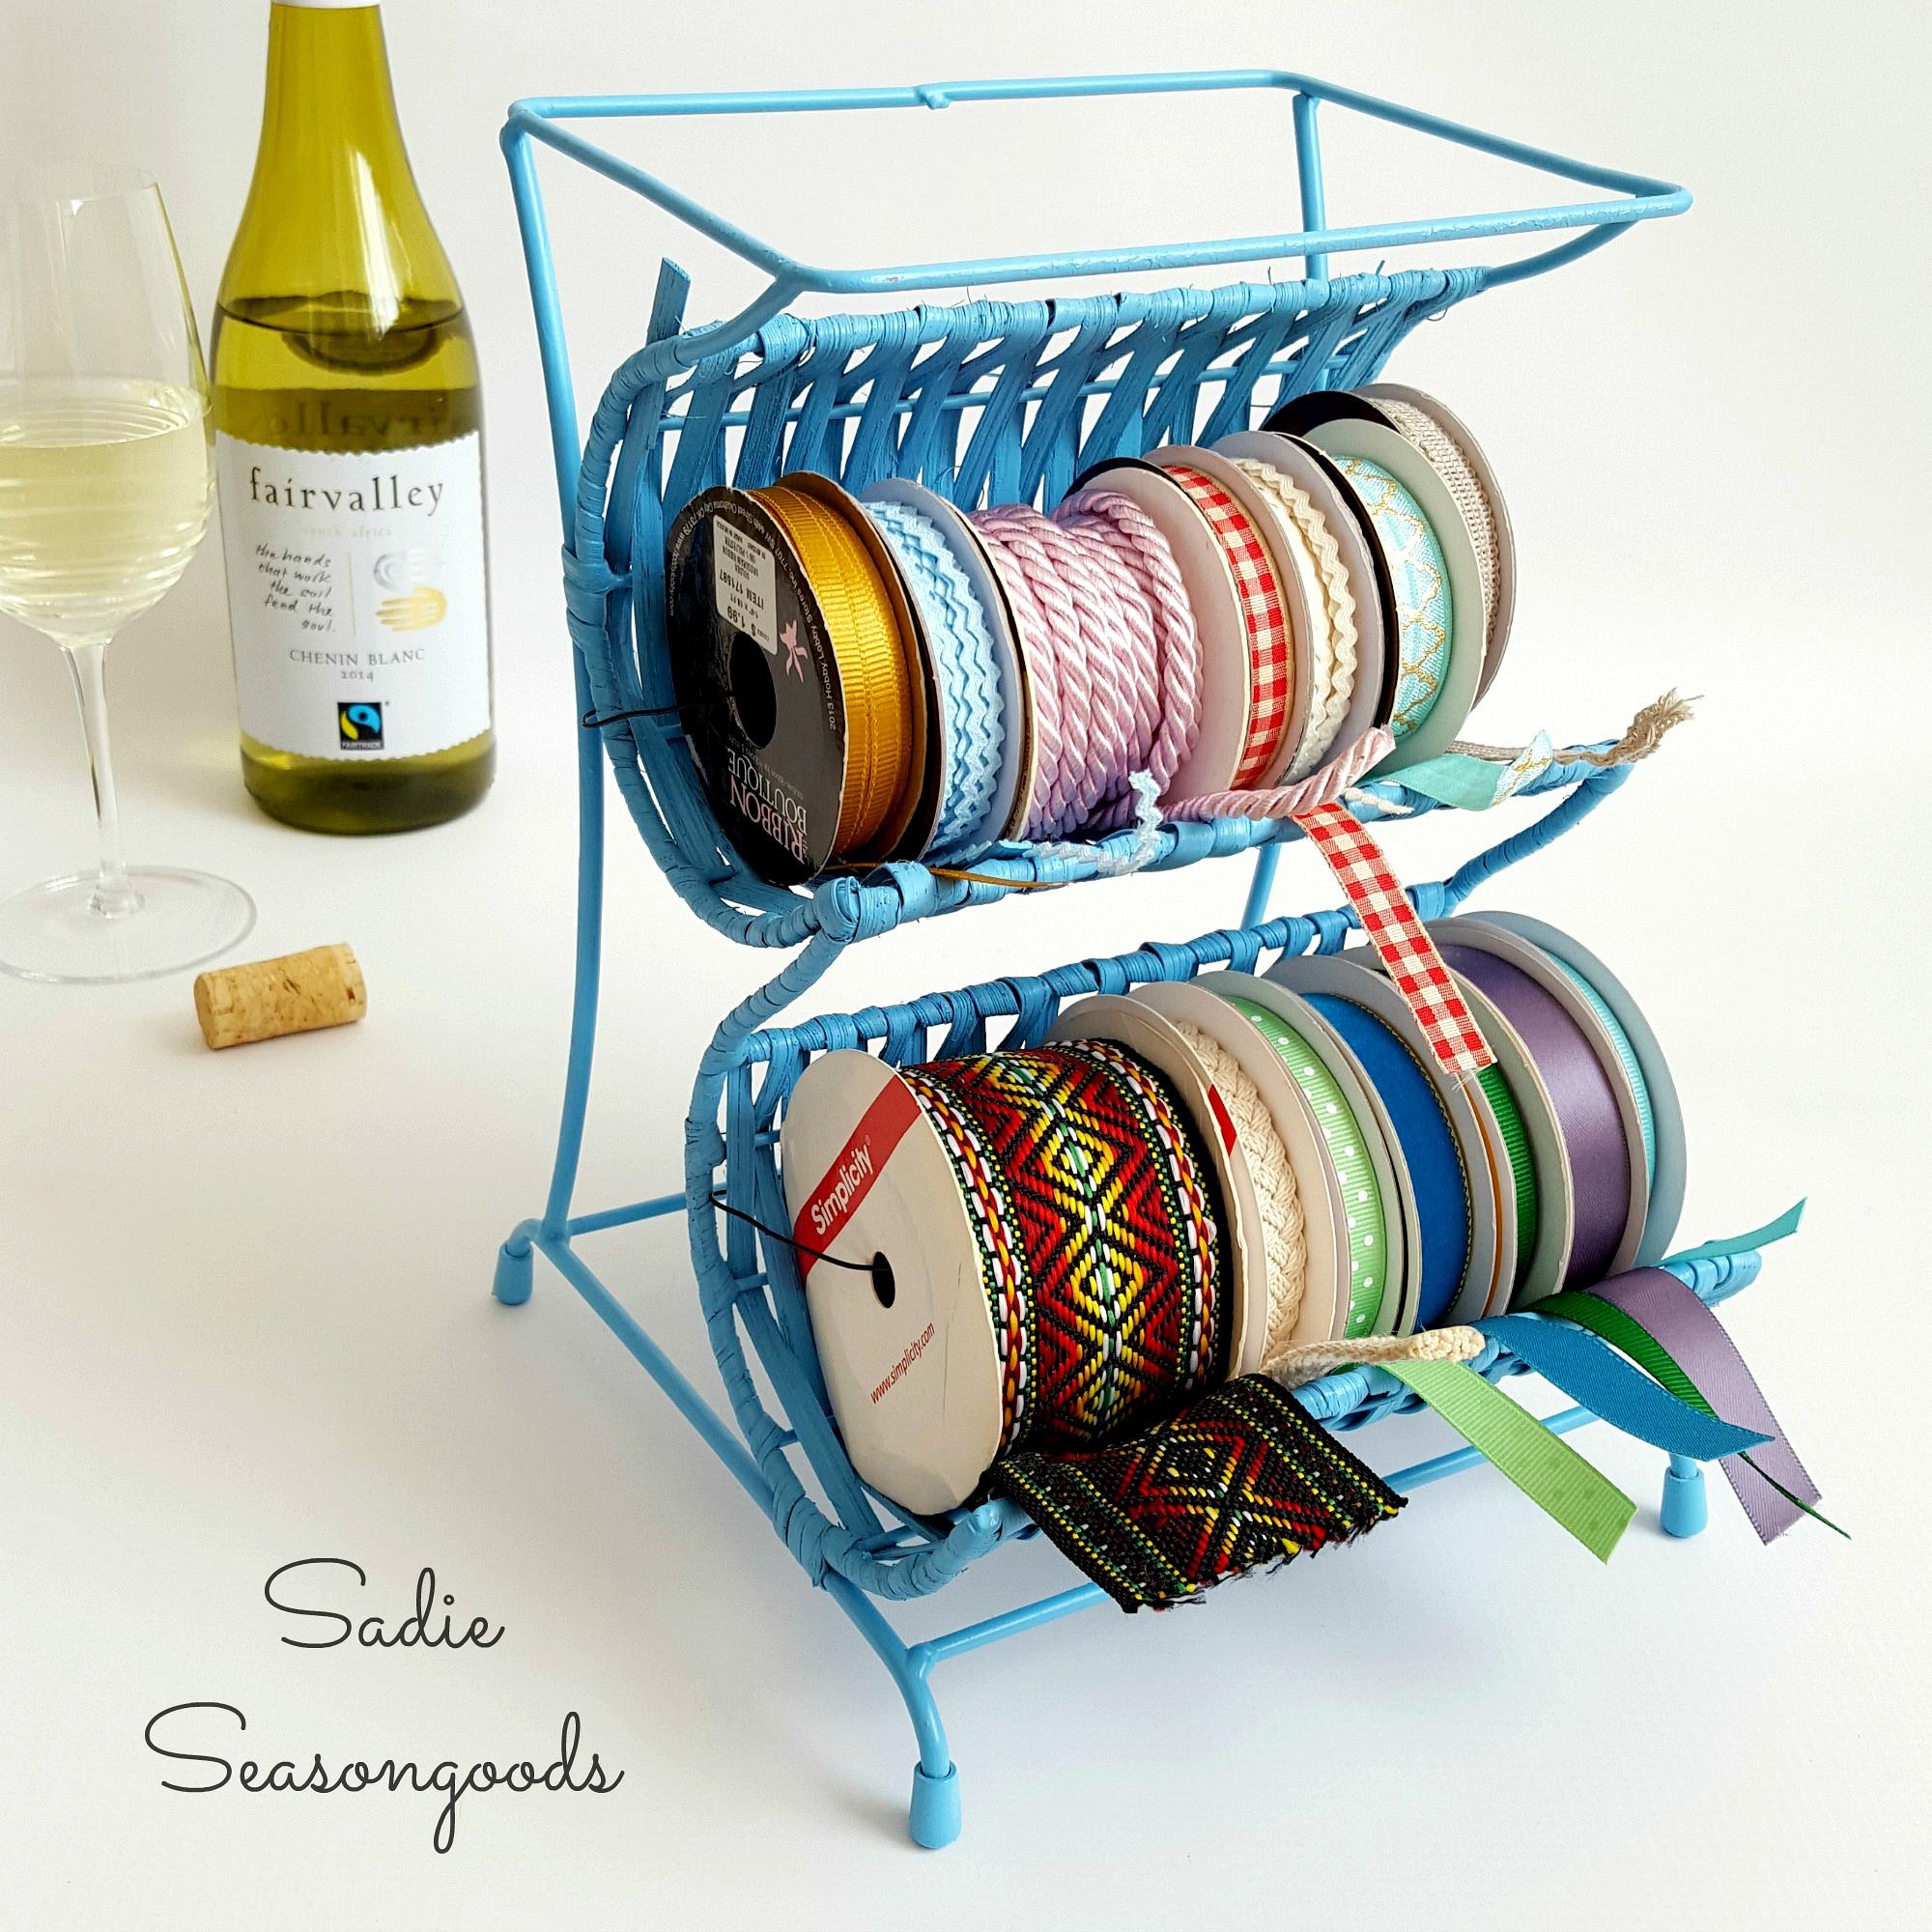 Wine_bottle_holder_repurposed_into_craft_ribbon_cradle_holder_Sadie_Seasongoods